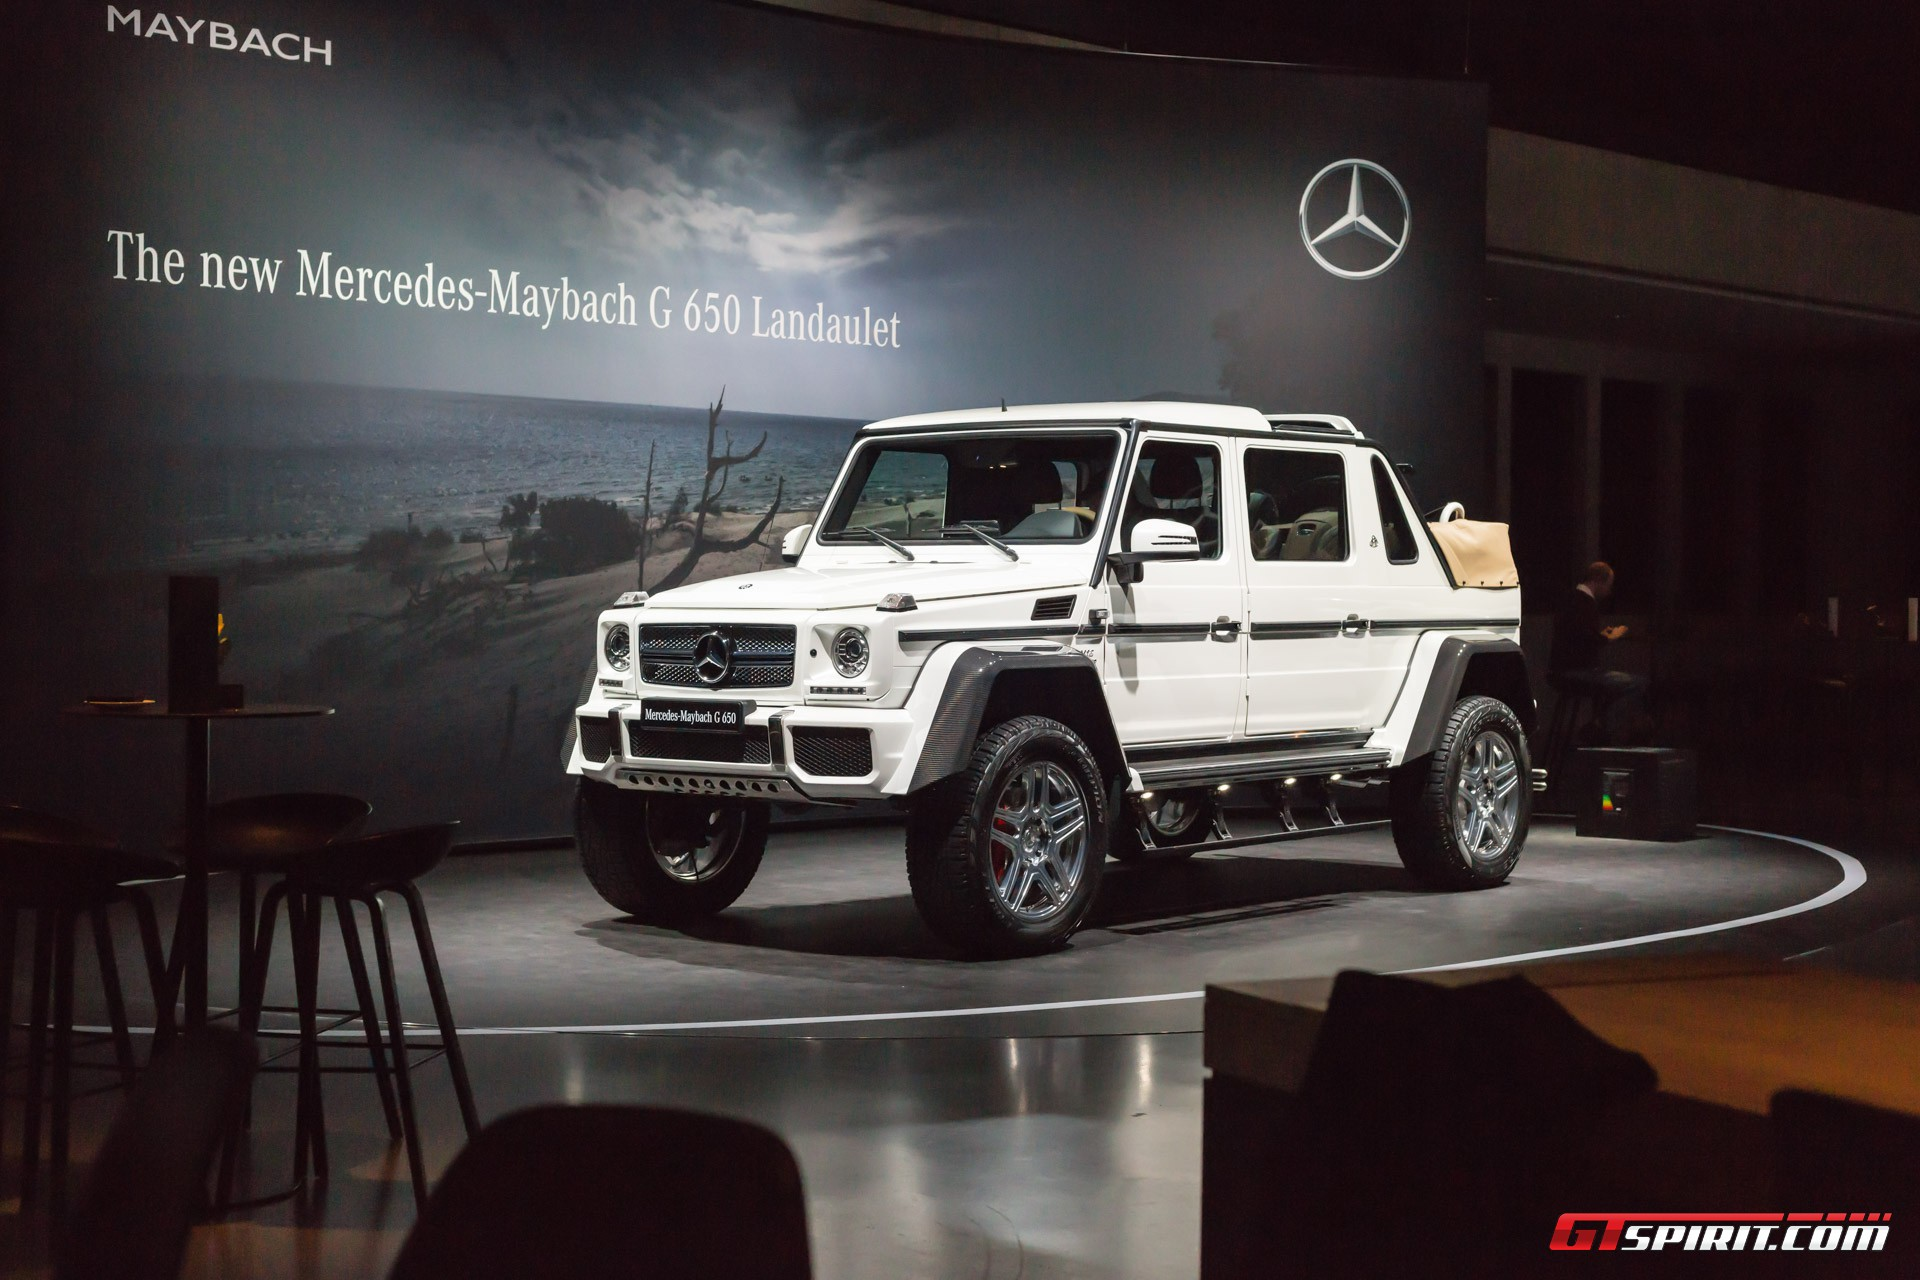 https://storage.googleapis.com/gtspirit/uploads/2017/02/Mercedes-Benz-Maybach-G650-Landaulet-Geneva-2017-16.jpg